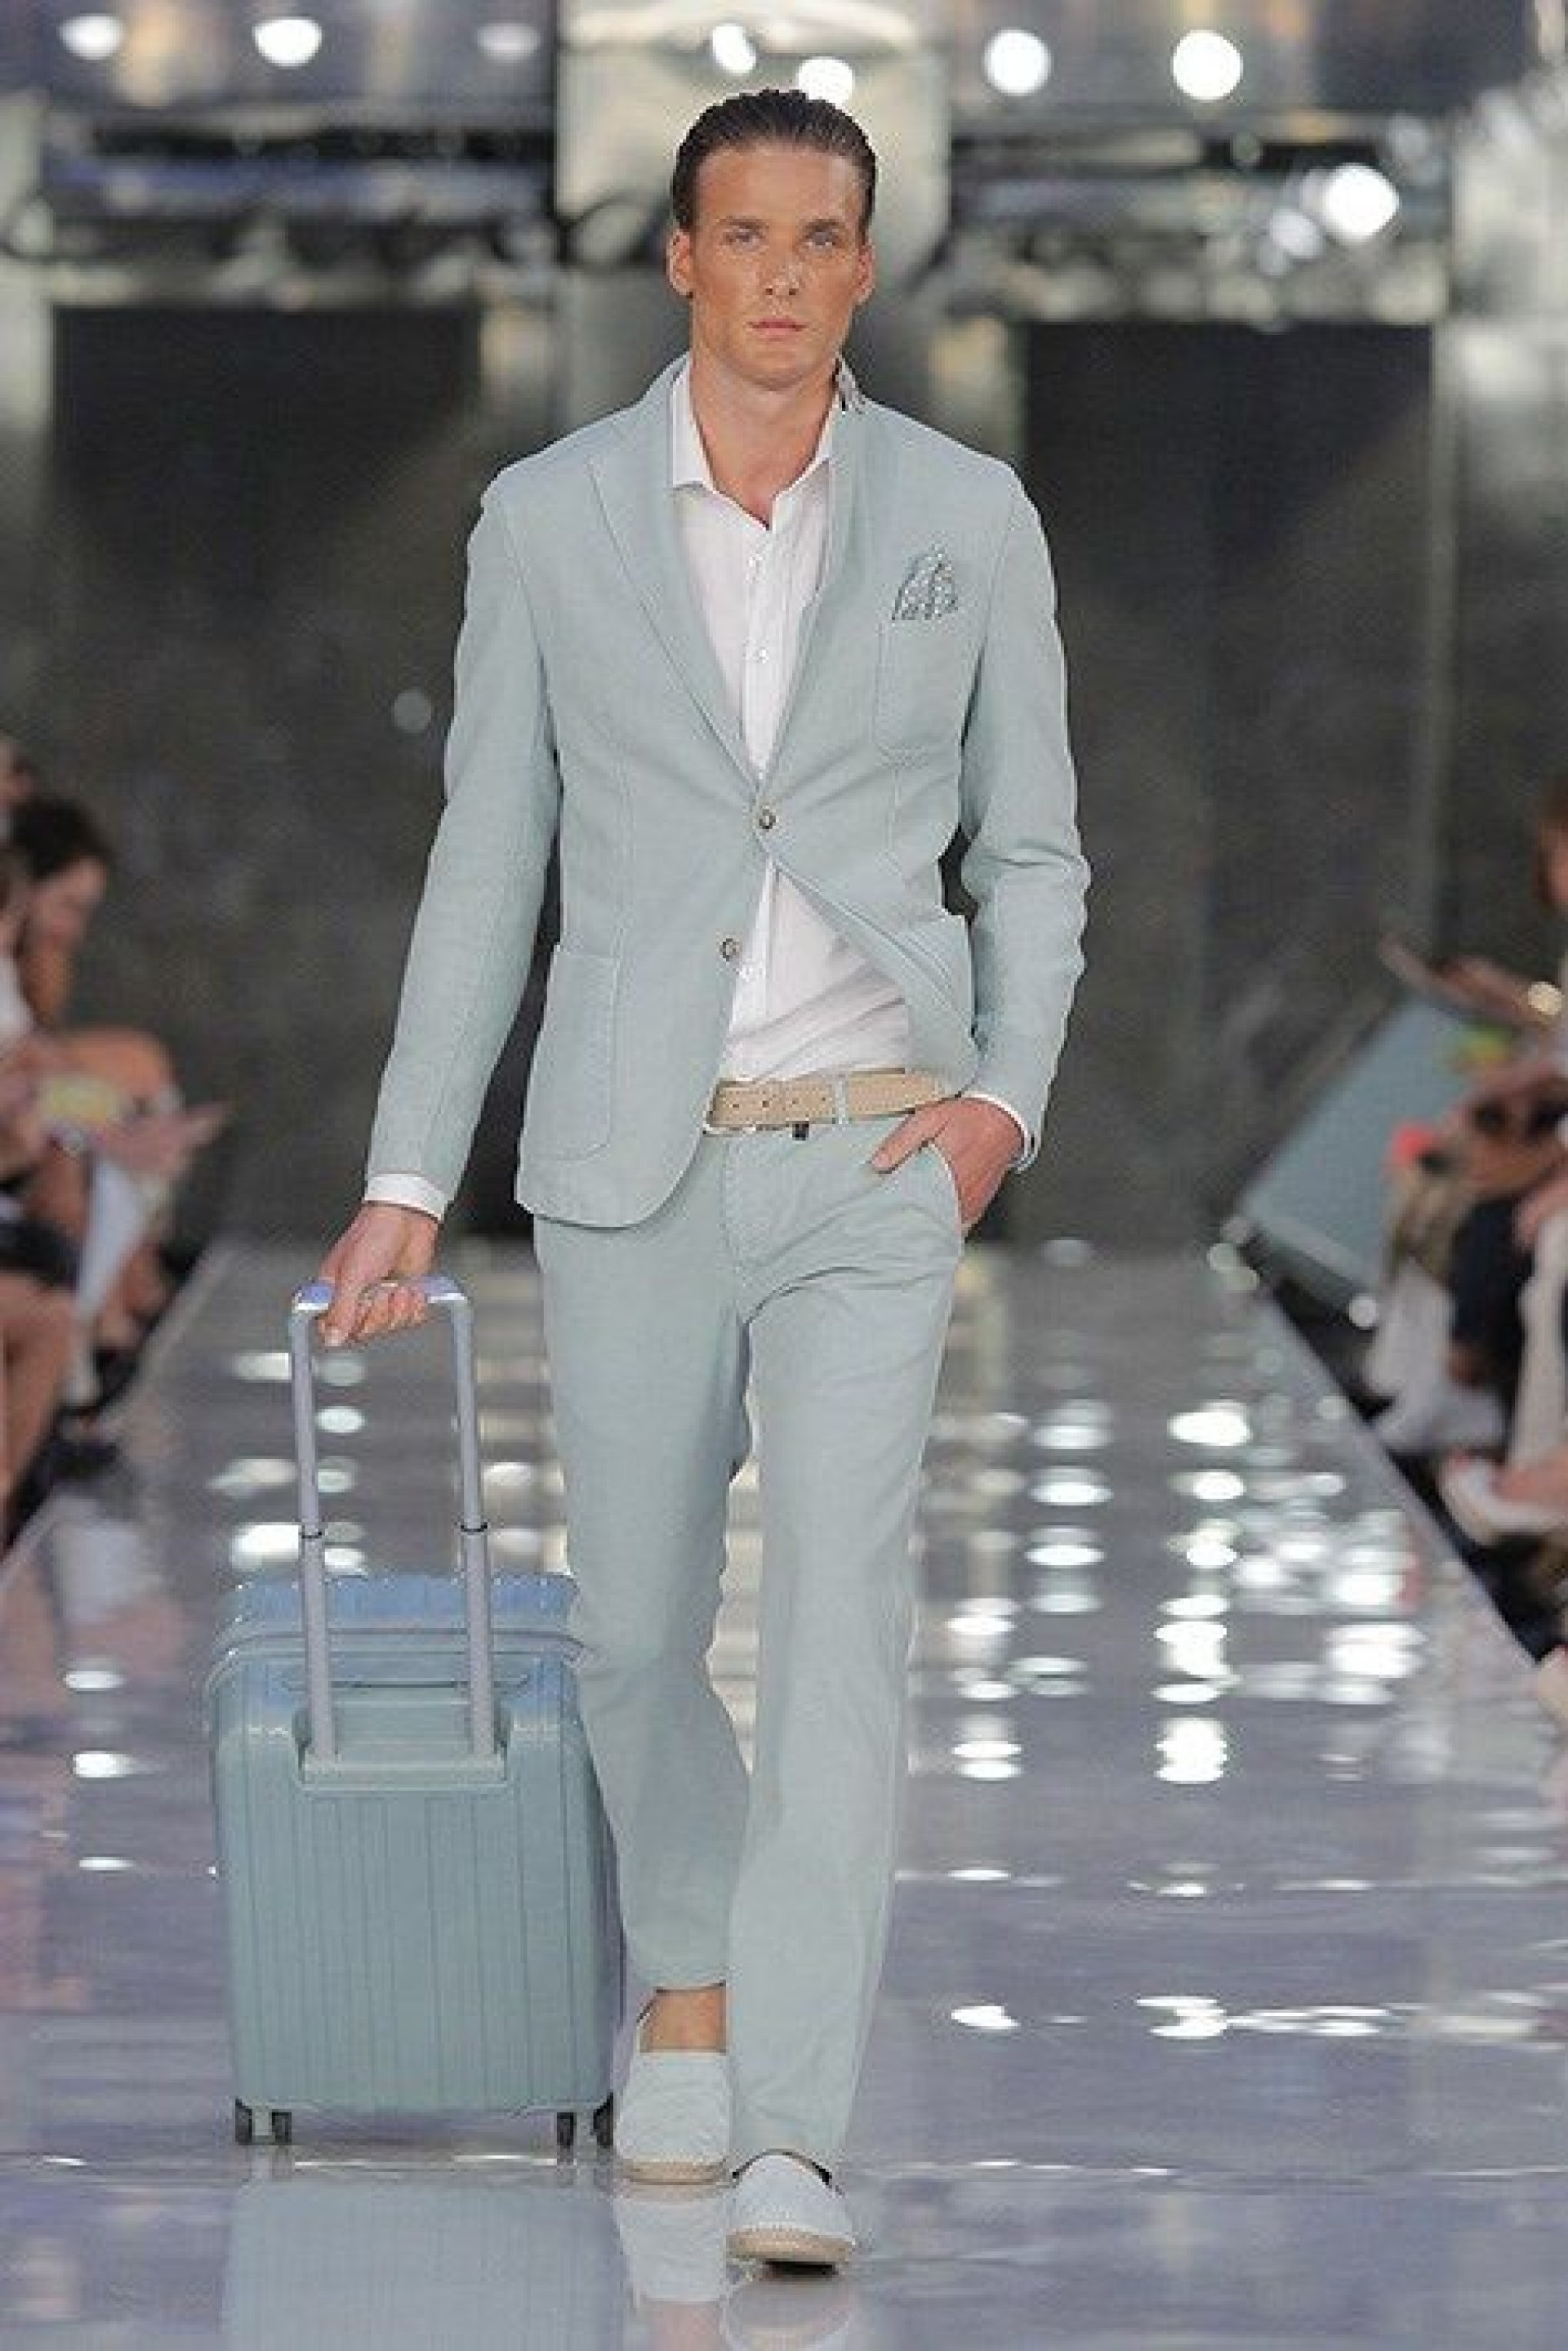 Men's wear, men's suit